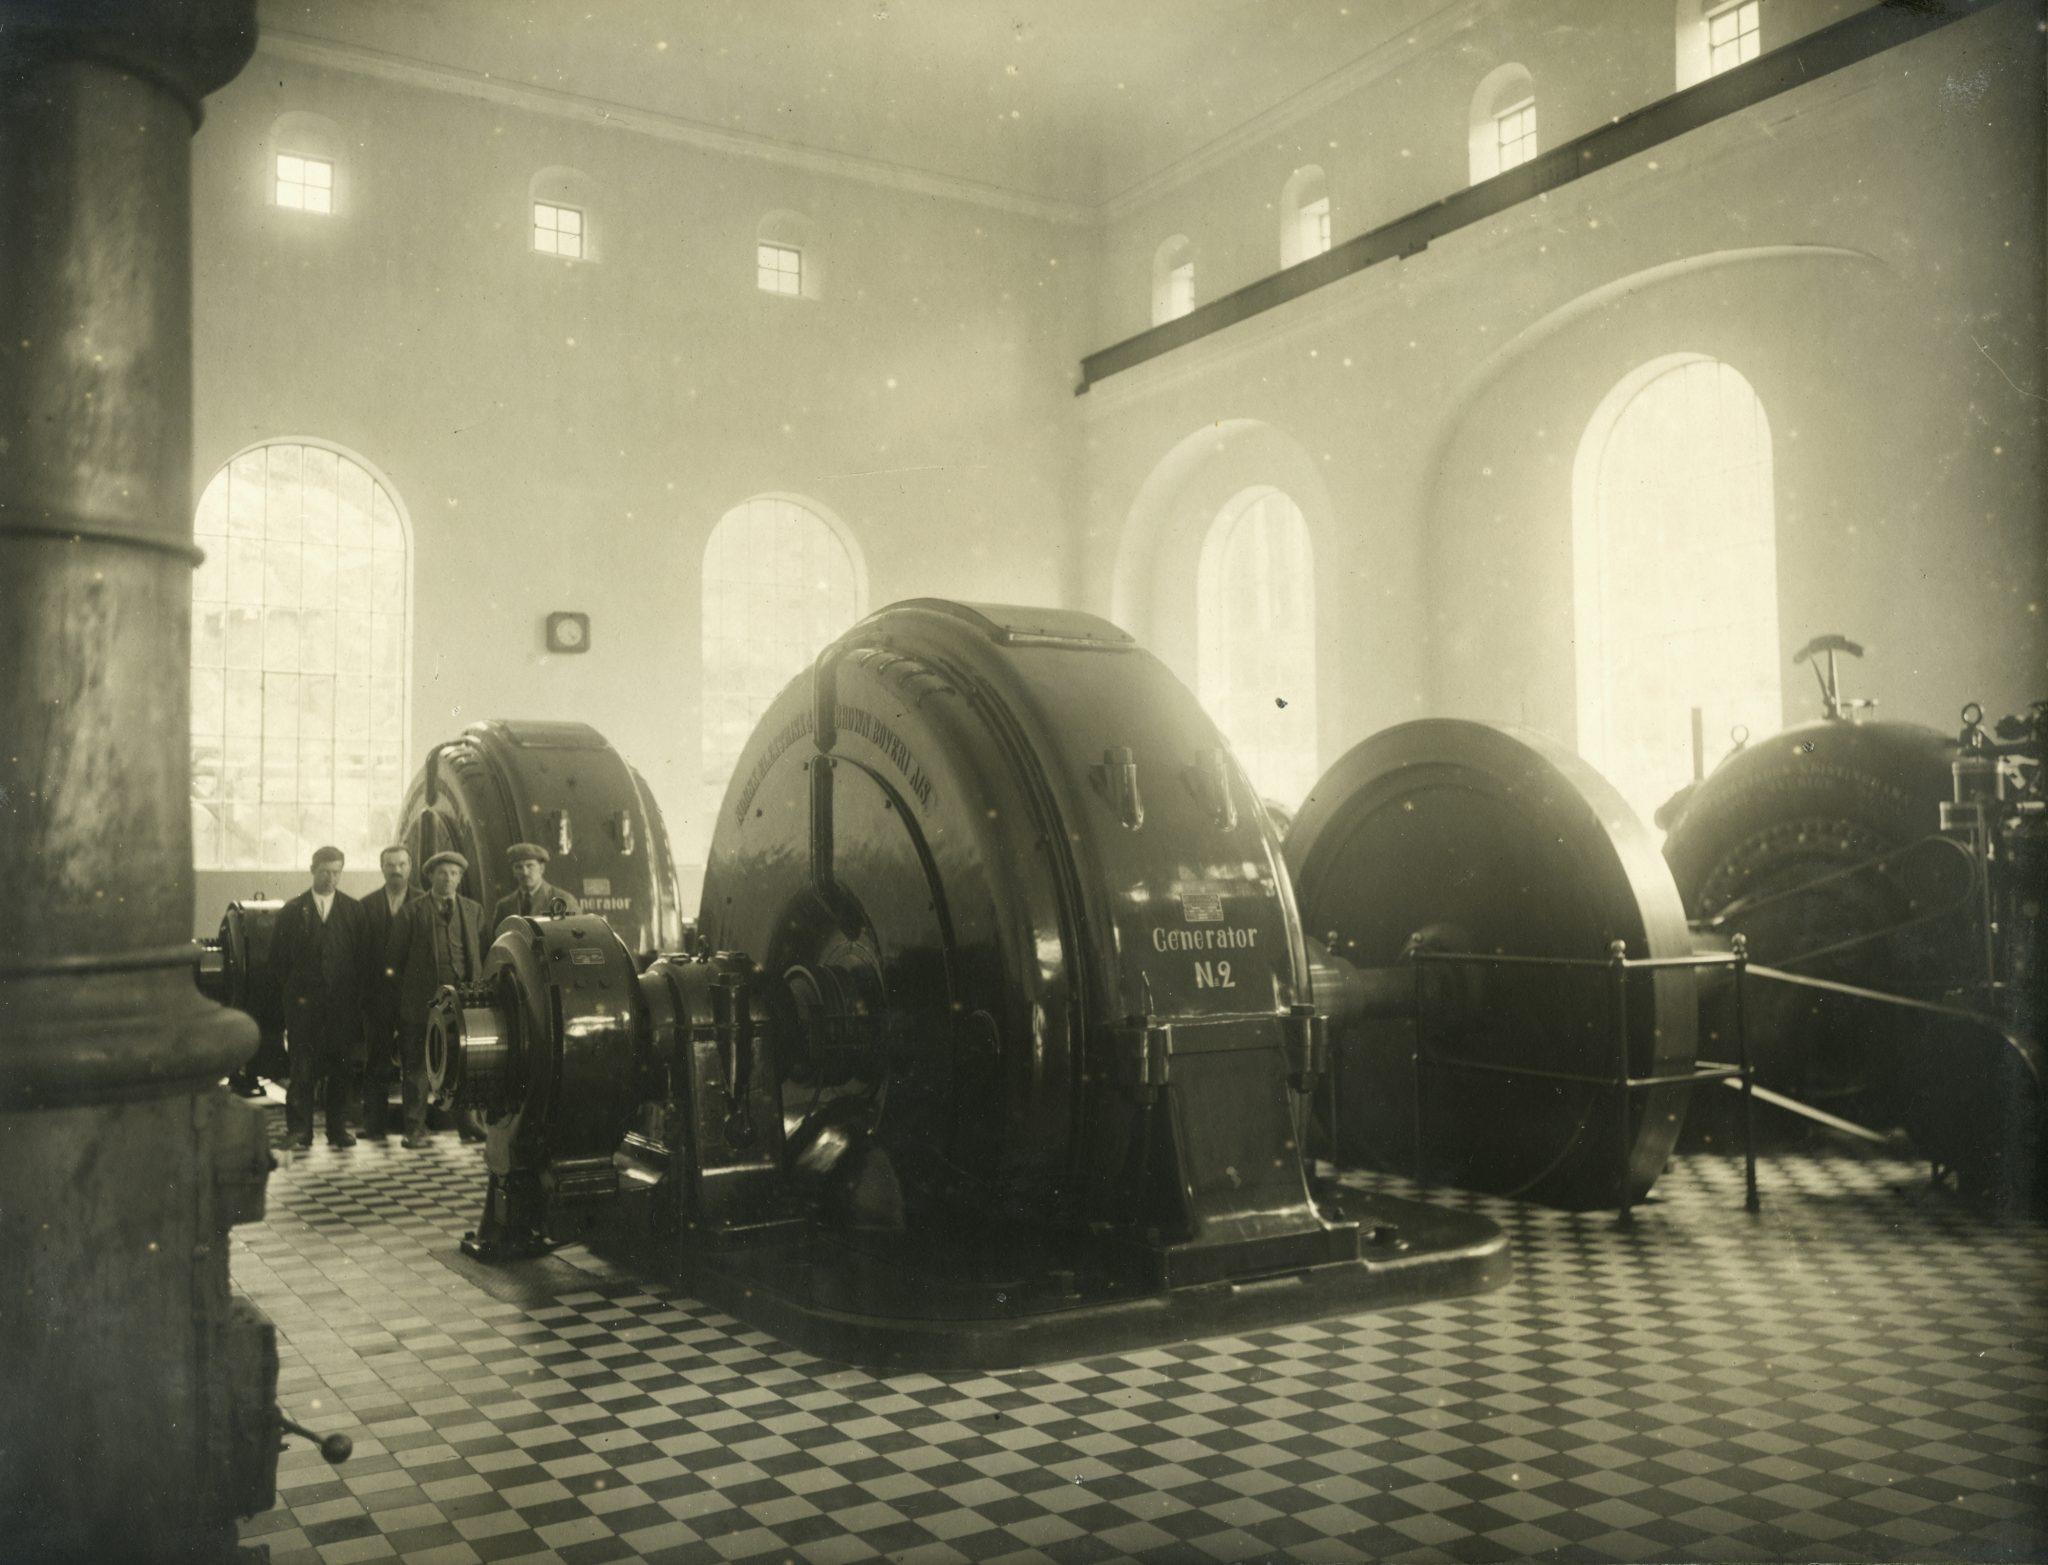 Gamle generatorar